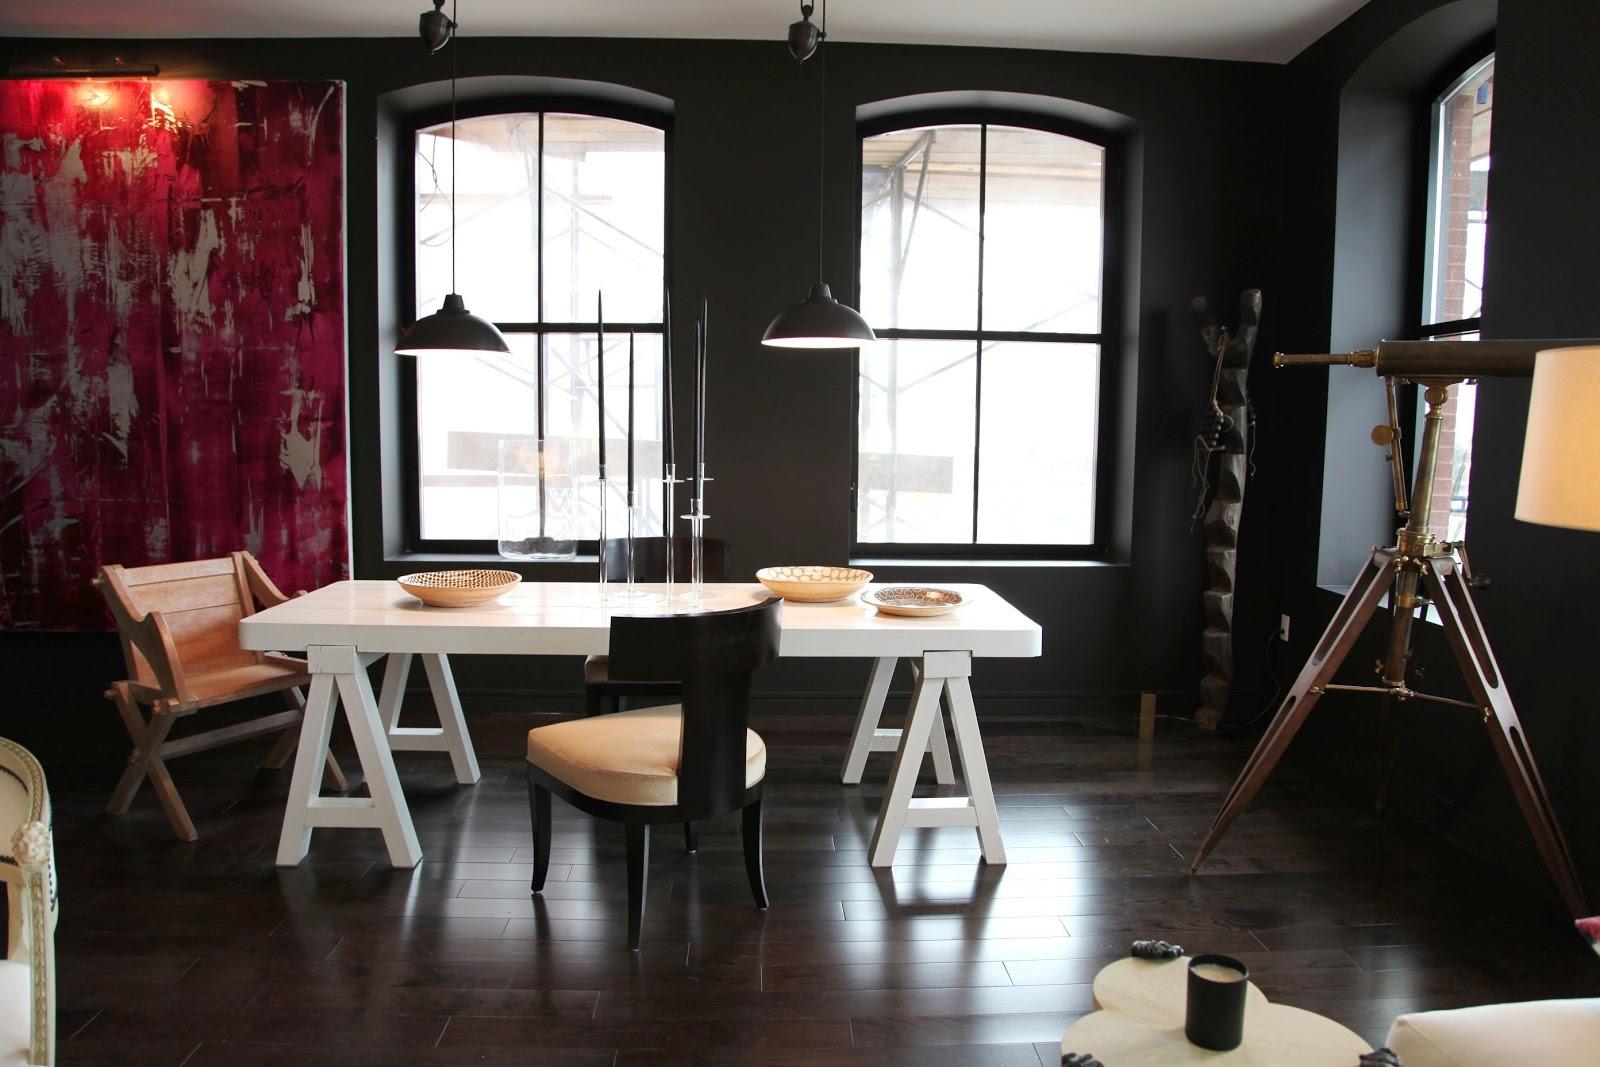 Antony Todd Sofa Travel Trailer Air Bed Minima Home Hearst Designer Visions